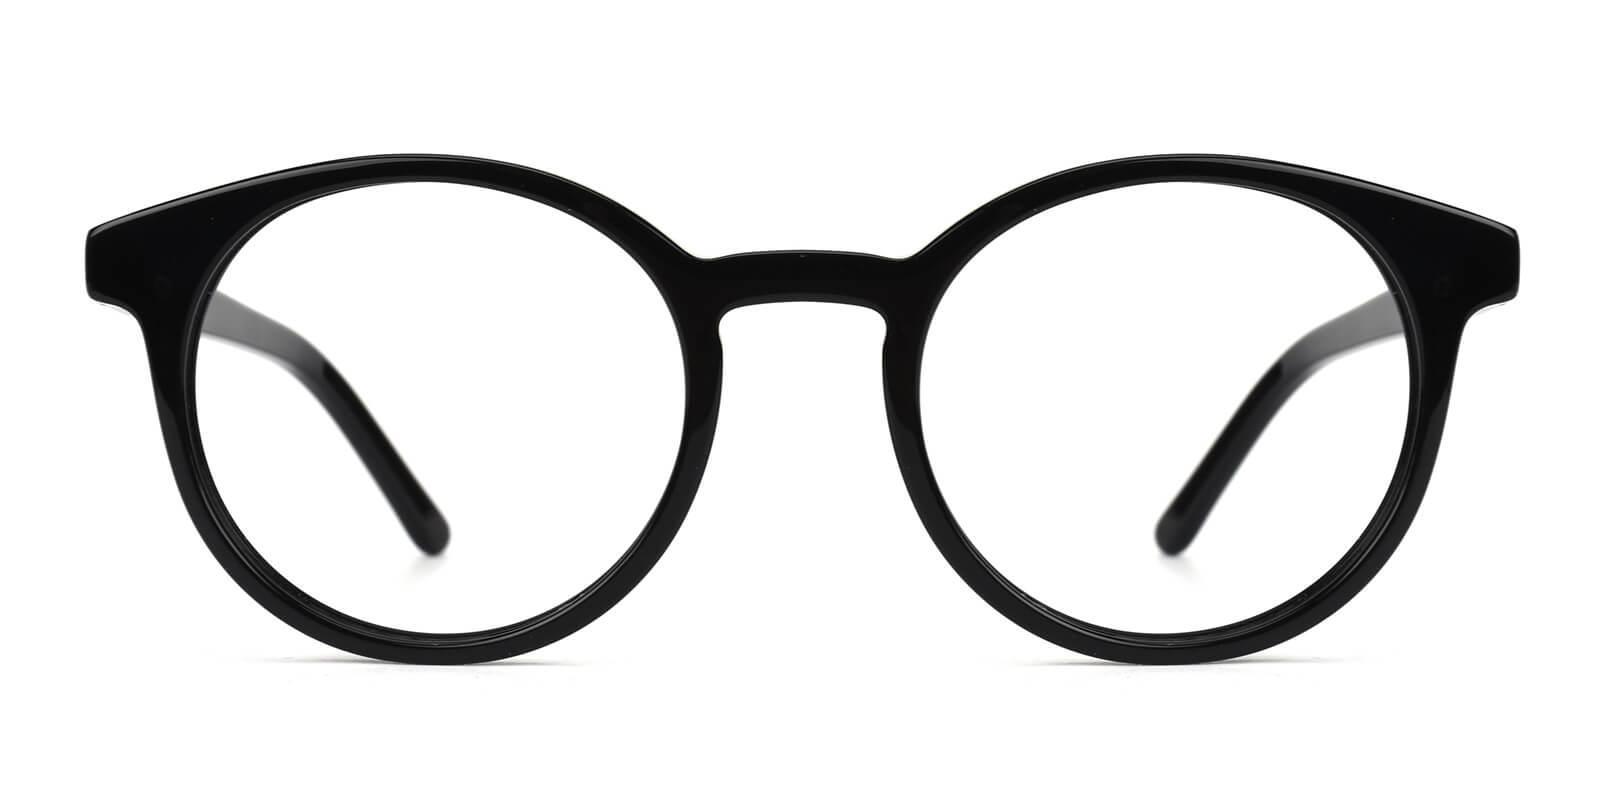 Chocolate-Black-Round-Acetate-Eyeglasses-additional2